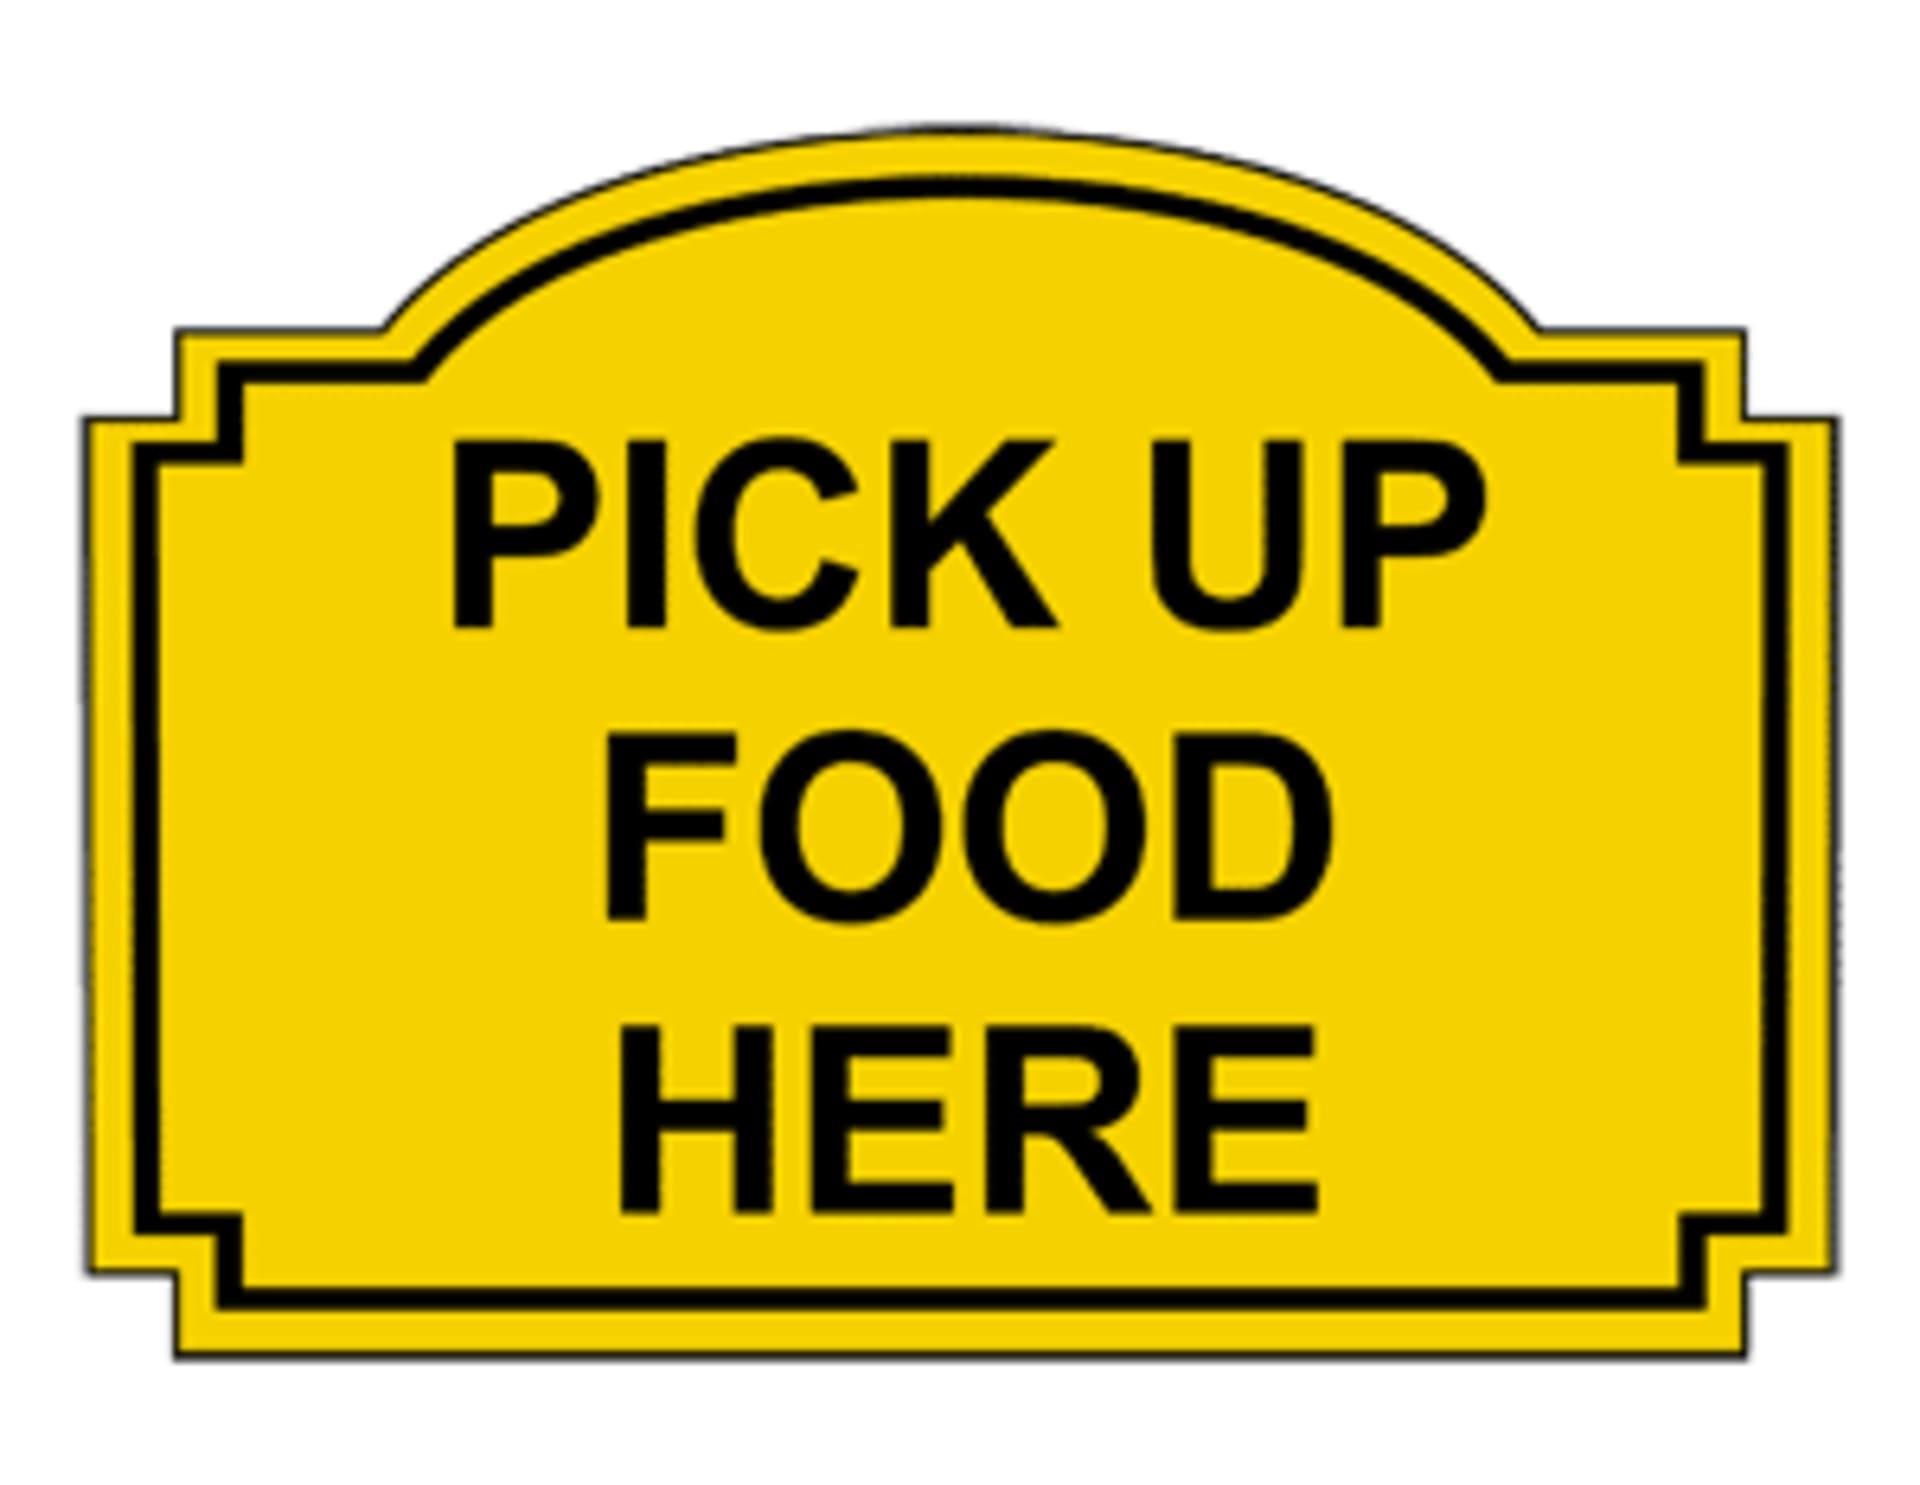 Order For Pickup!